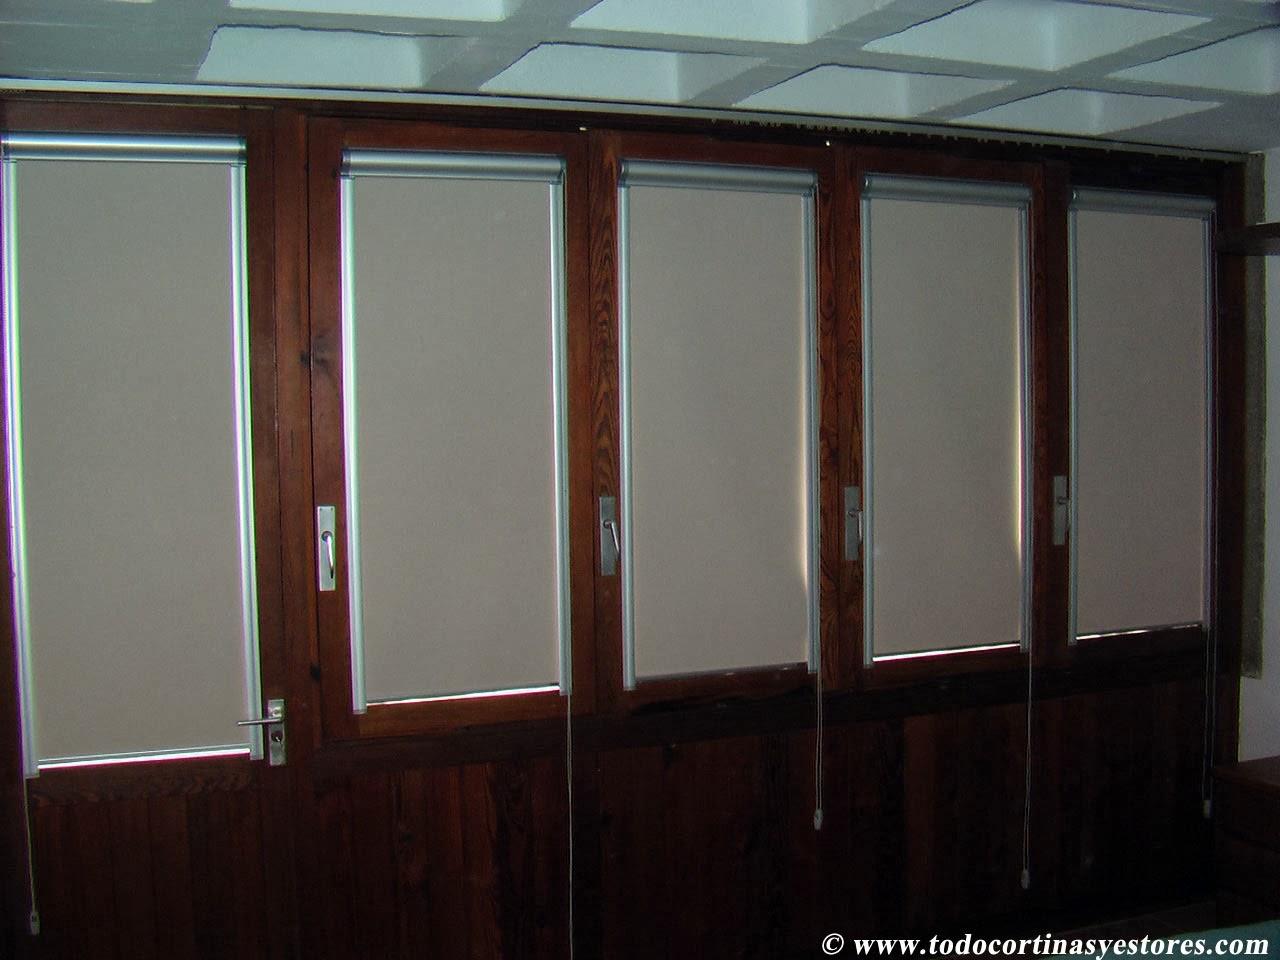 estores guiados opacos para ventanas abatibles